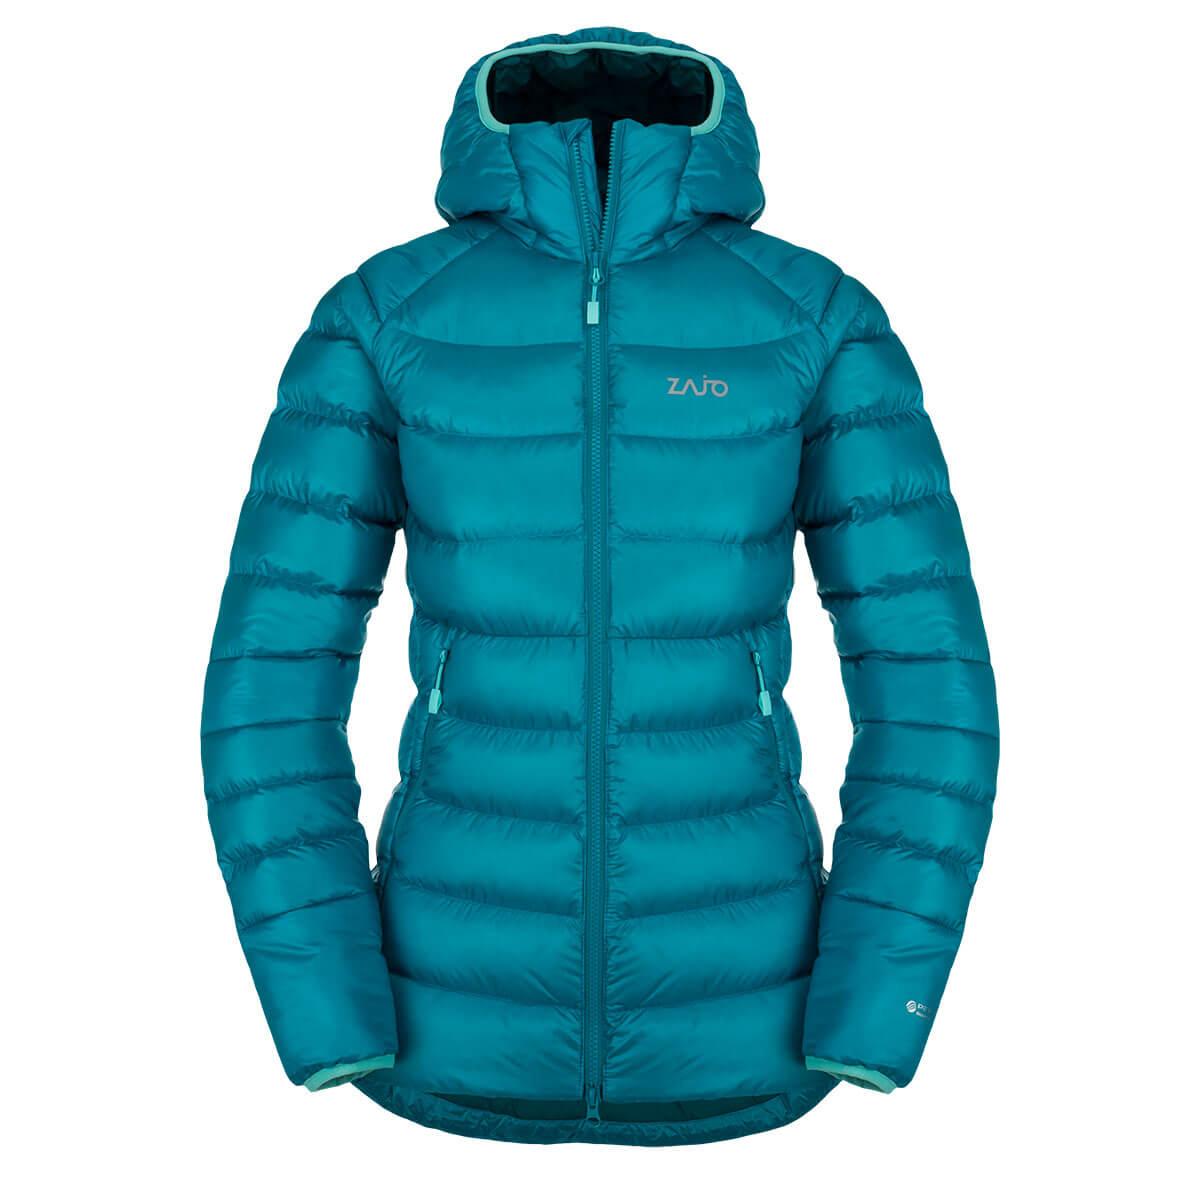 Zajo Dámska bunda Valbella W JKT Enamel Blue - veľkosť XS